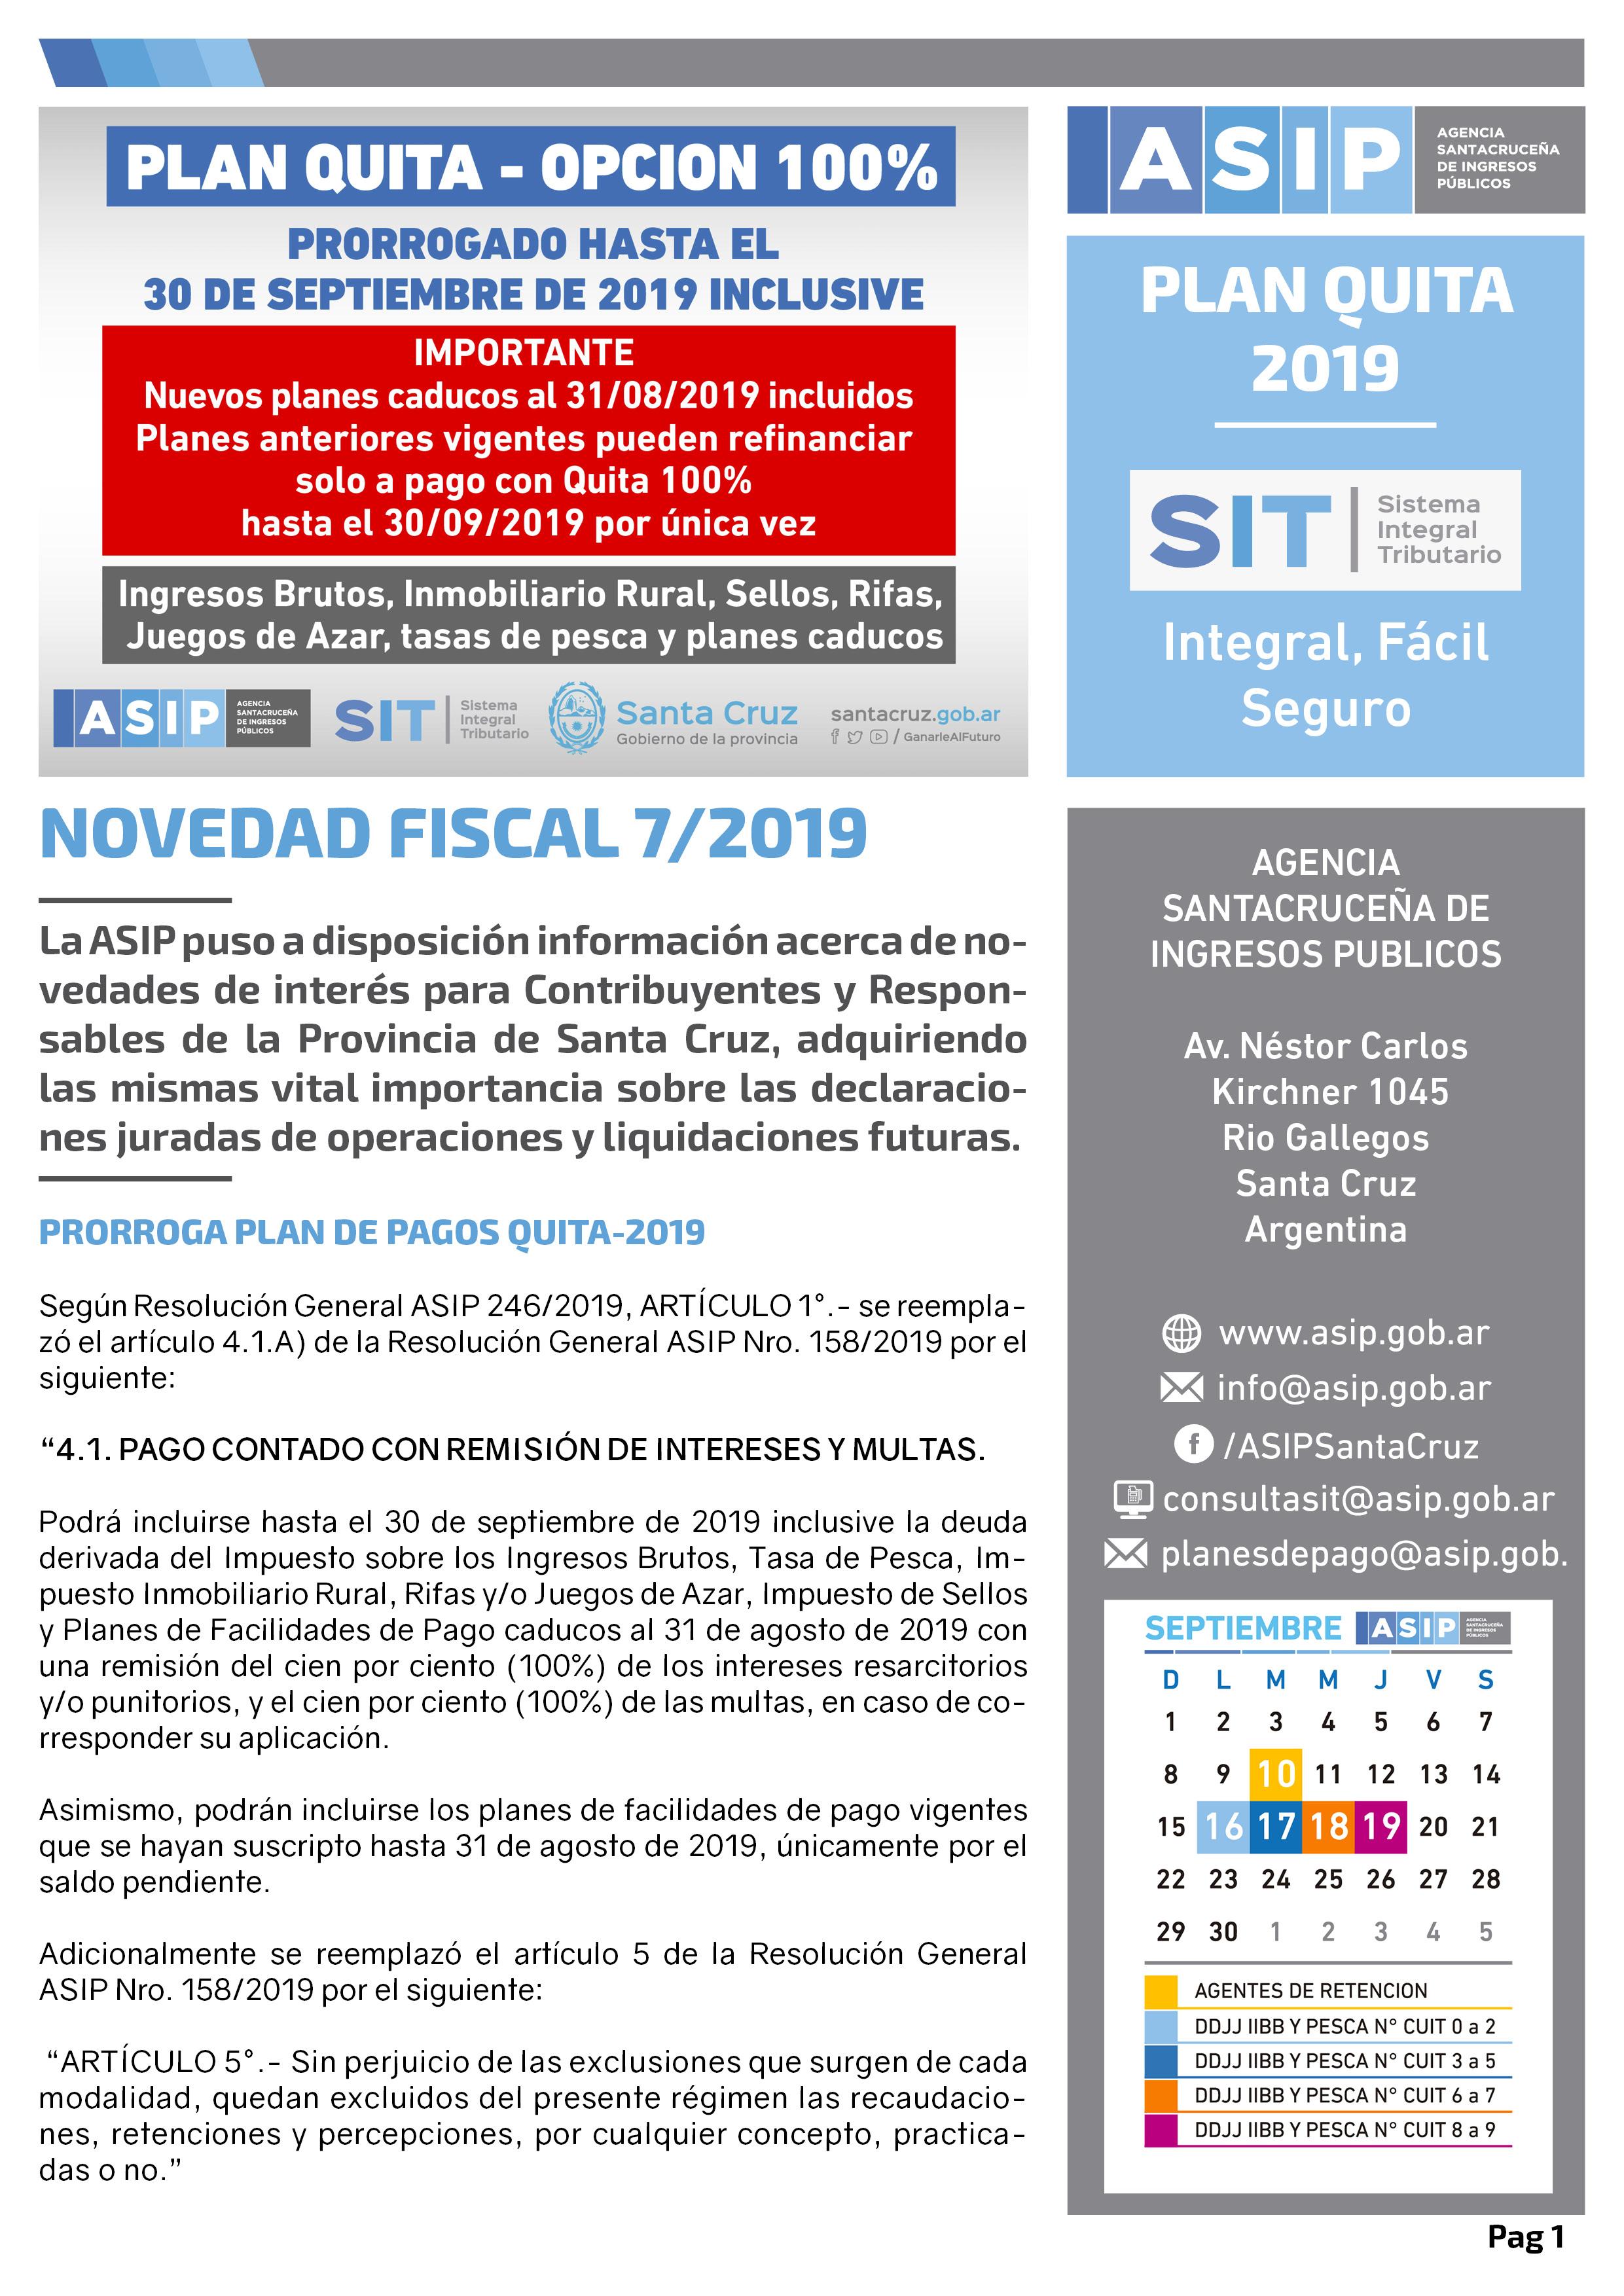 Alerta Fiscal ASIP 7-2019